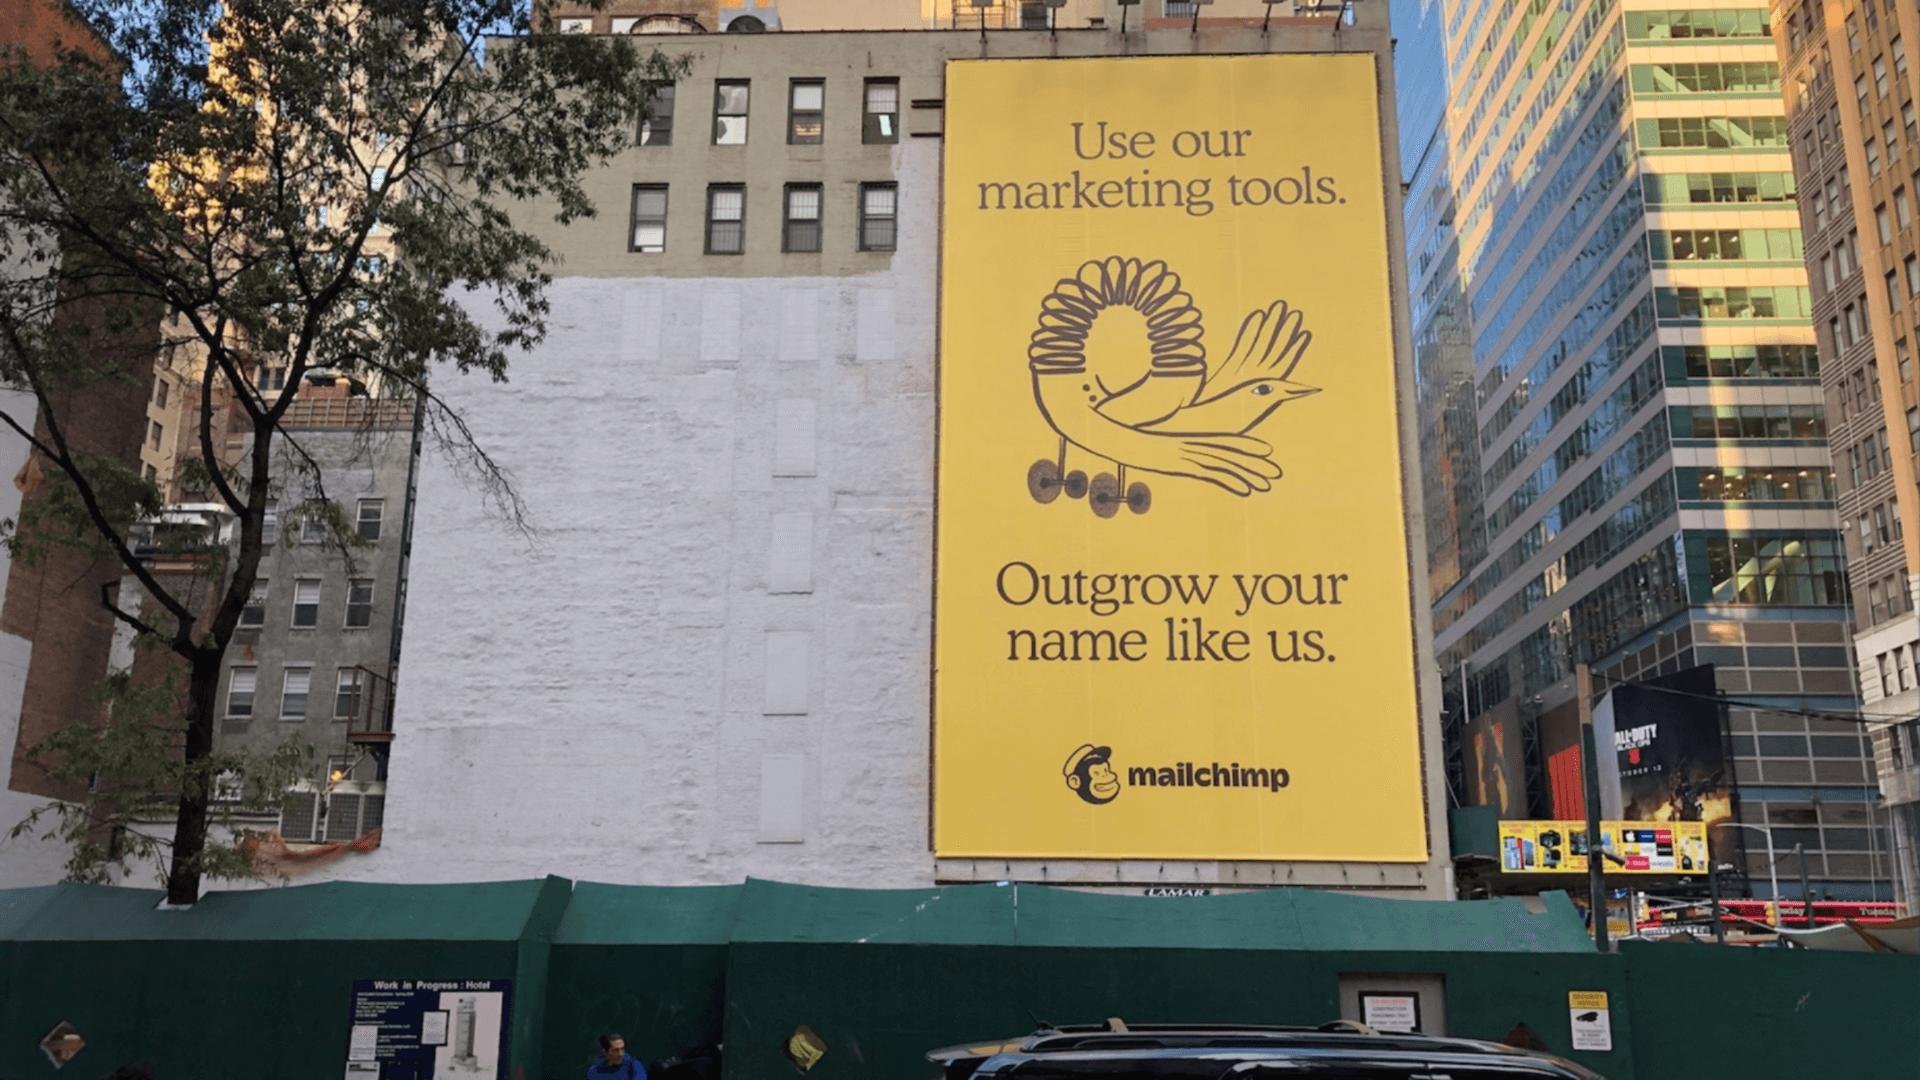 Mailchimp set to launch full-service marketing platform | DeviceDaily.com